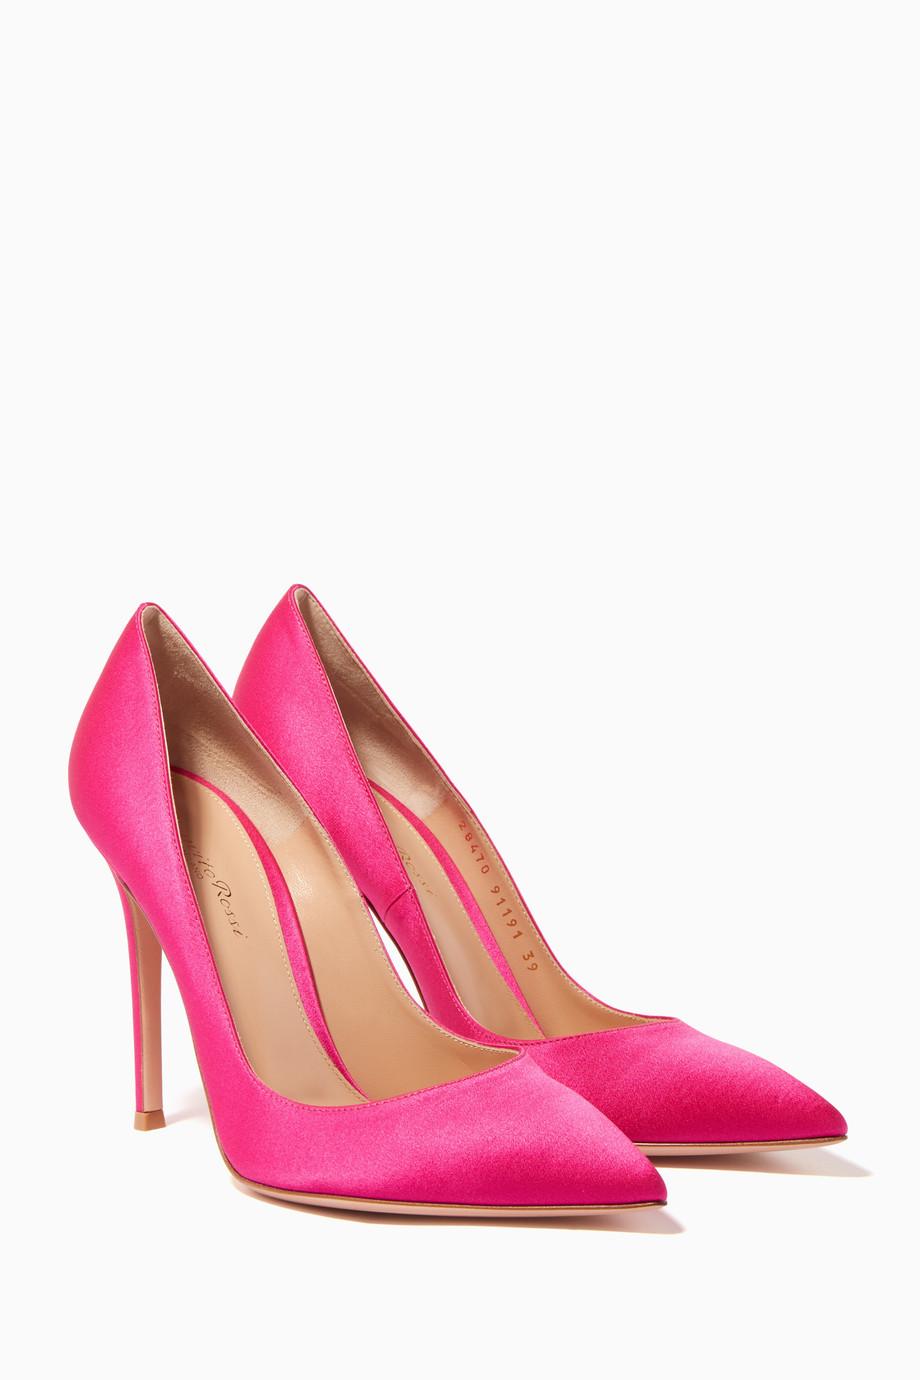 8557e81659 Shop Gianvito Rossi Pink Pink Gianvito Satin Pumps for Women ...